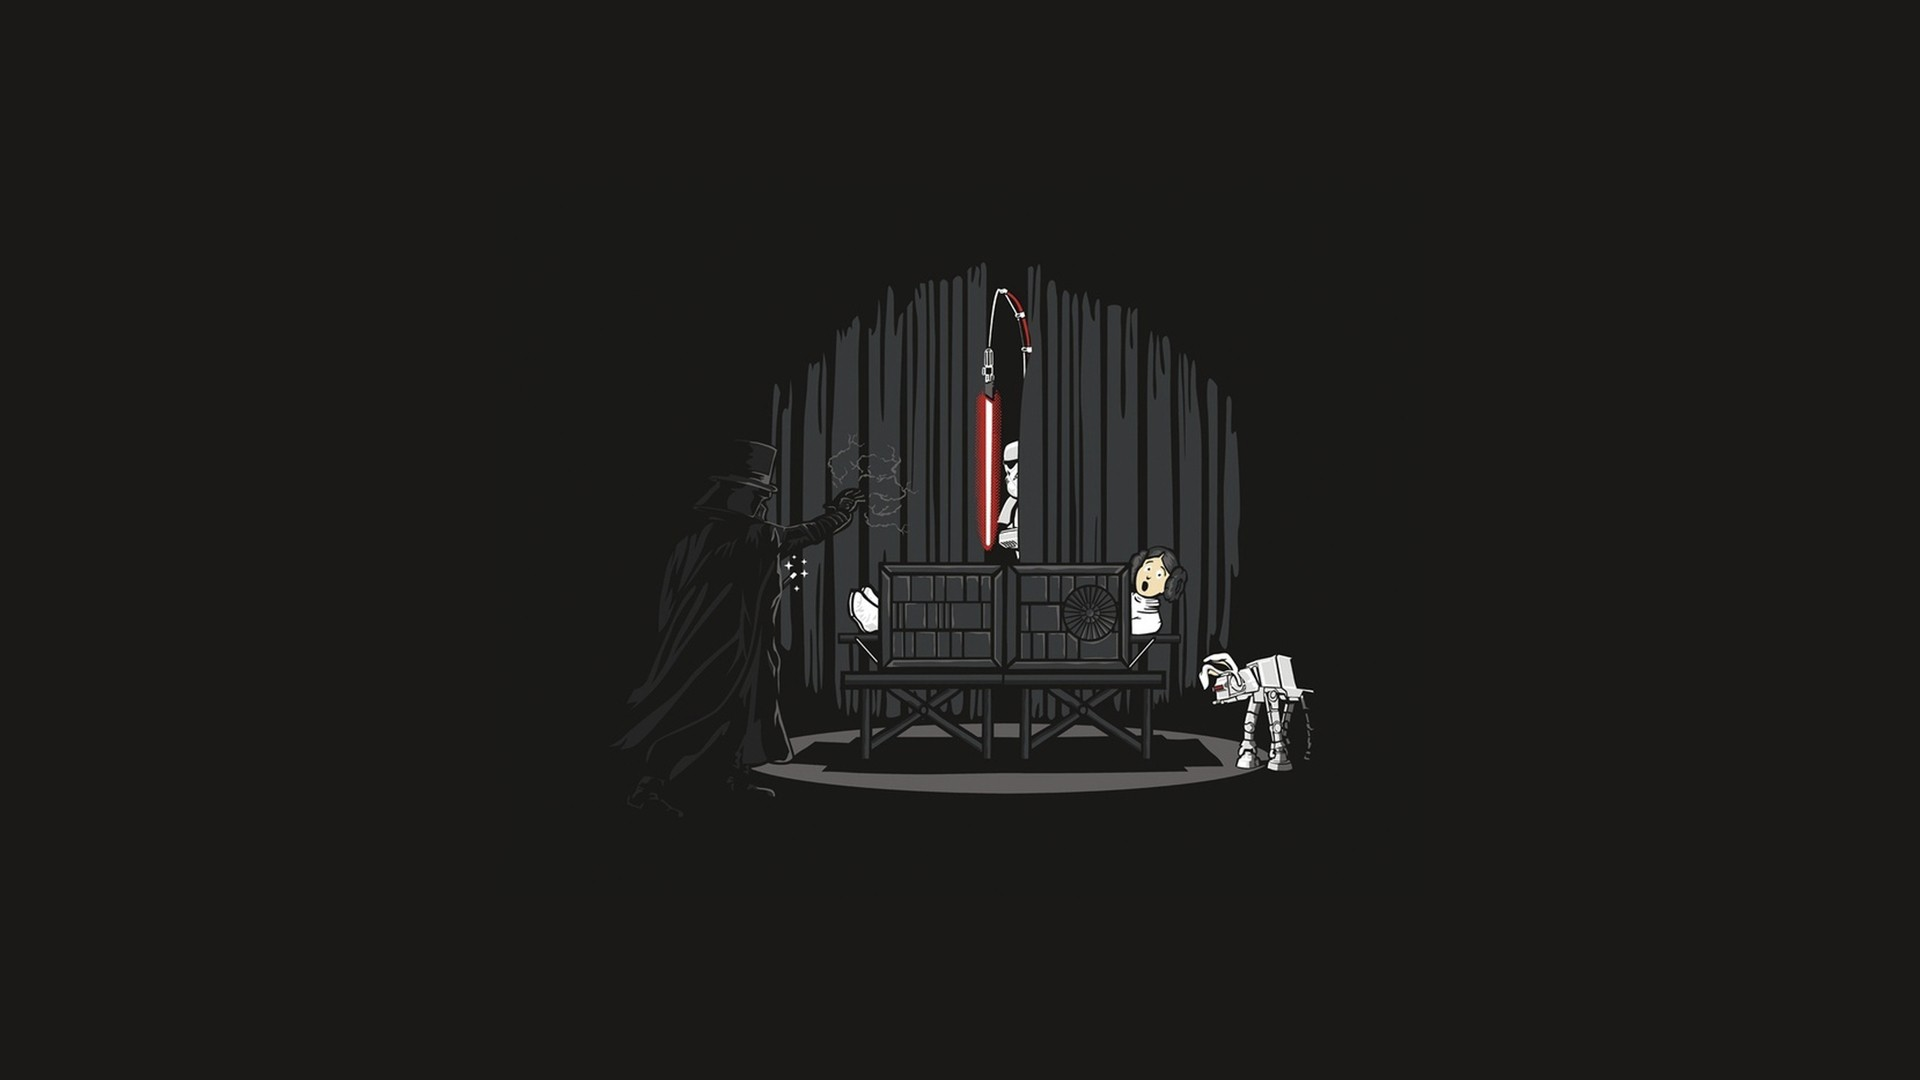 Star Wars Hd Wallpaper Background Image 1920x1080 Id 237514 Wallpaper Abyss